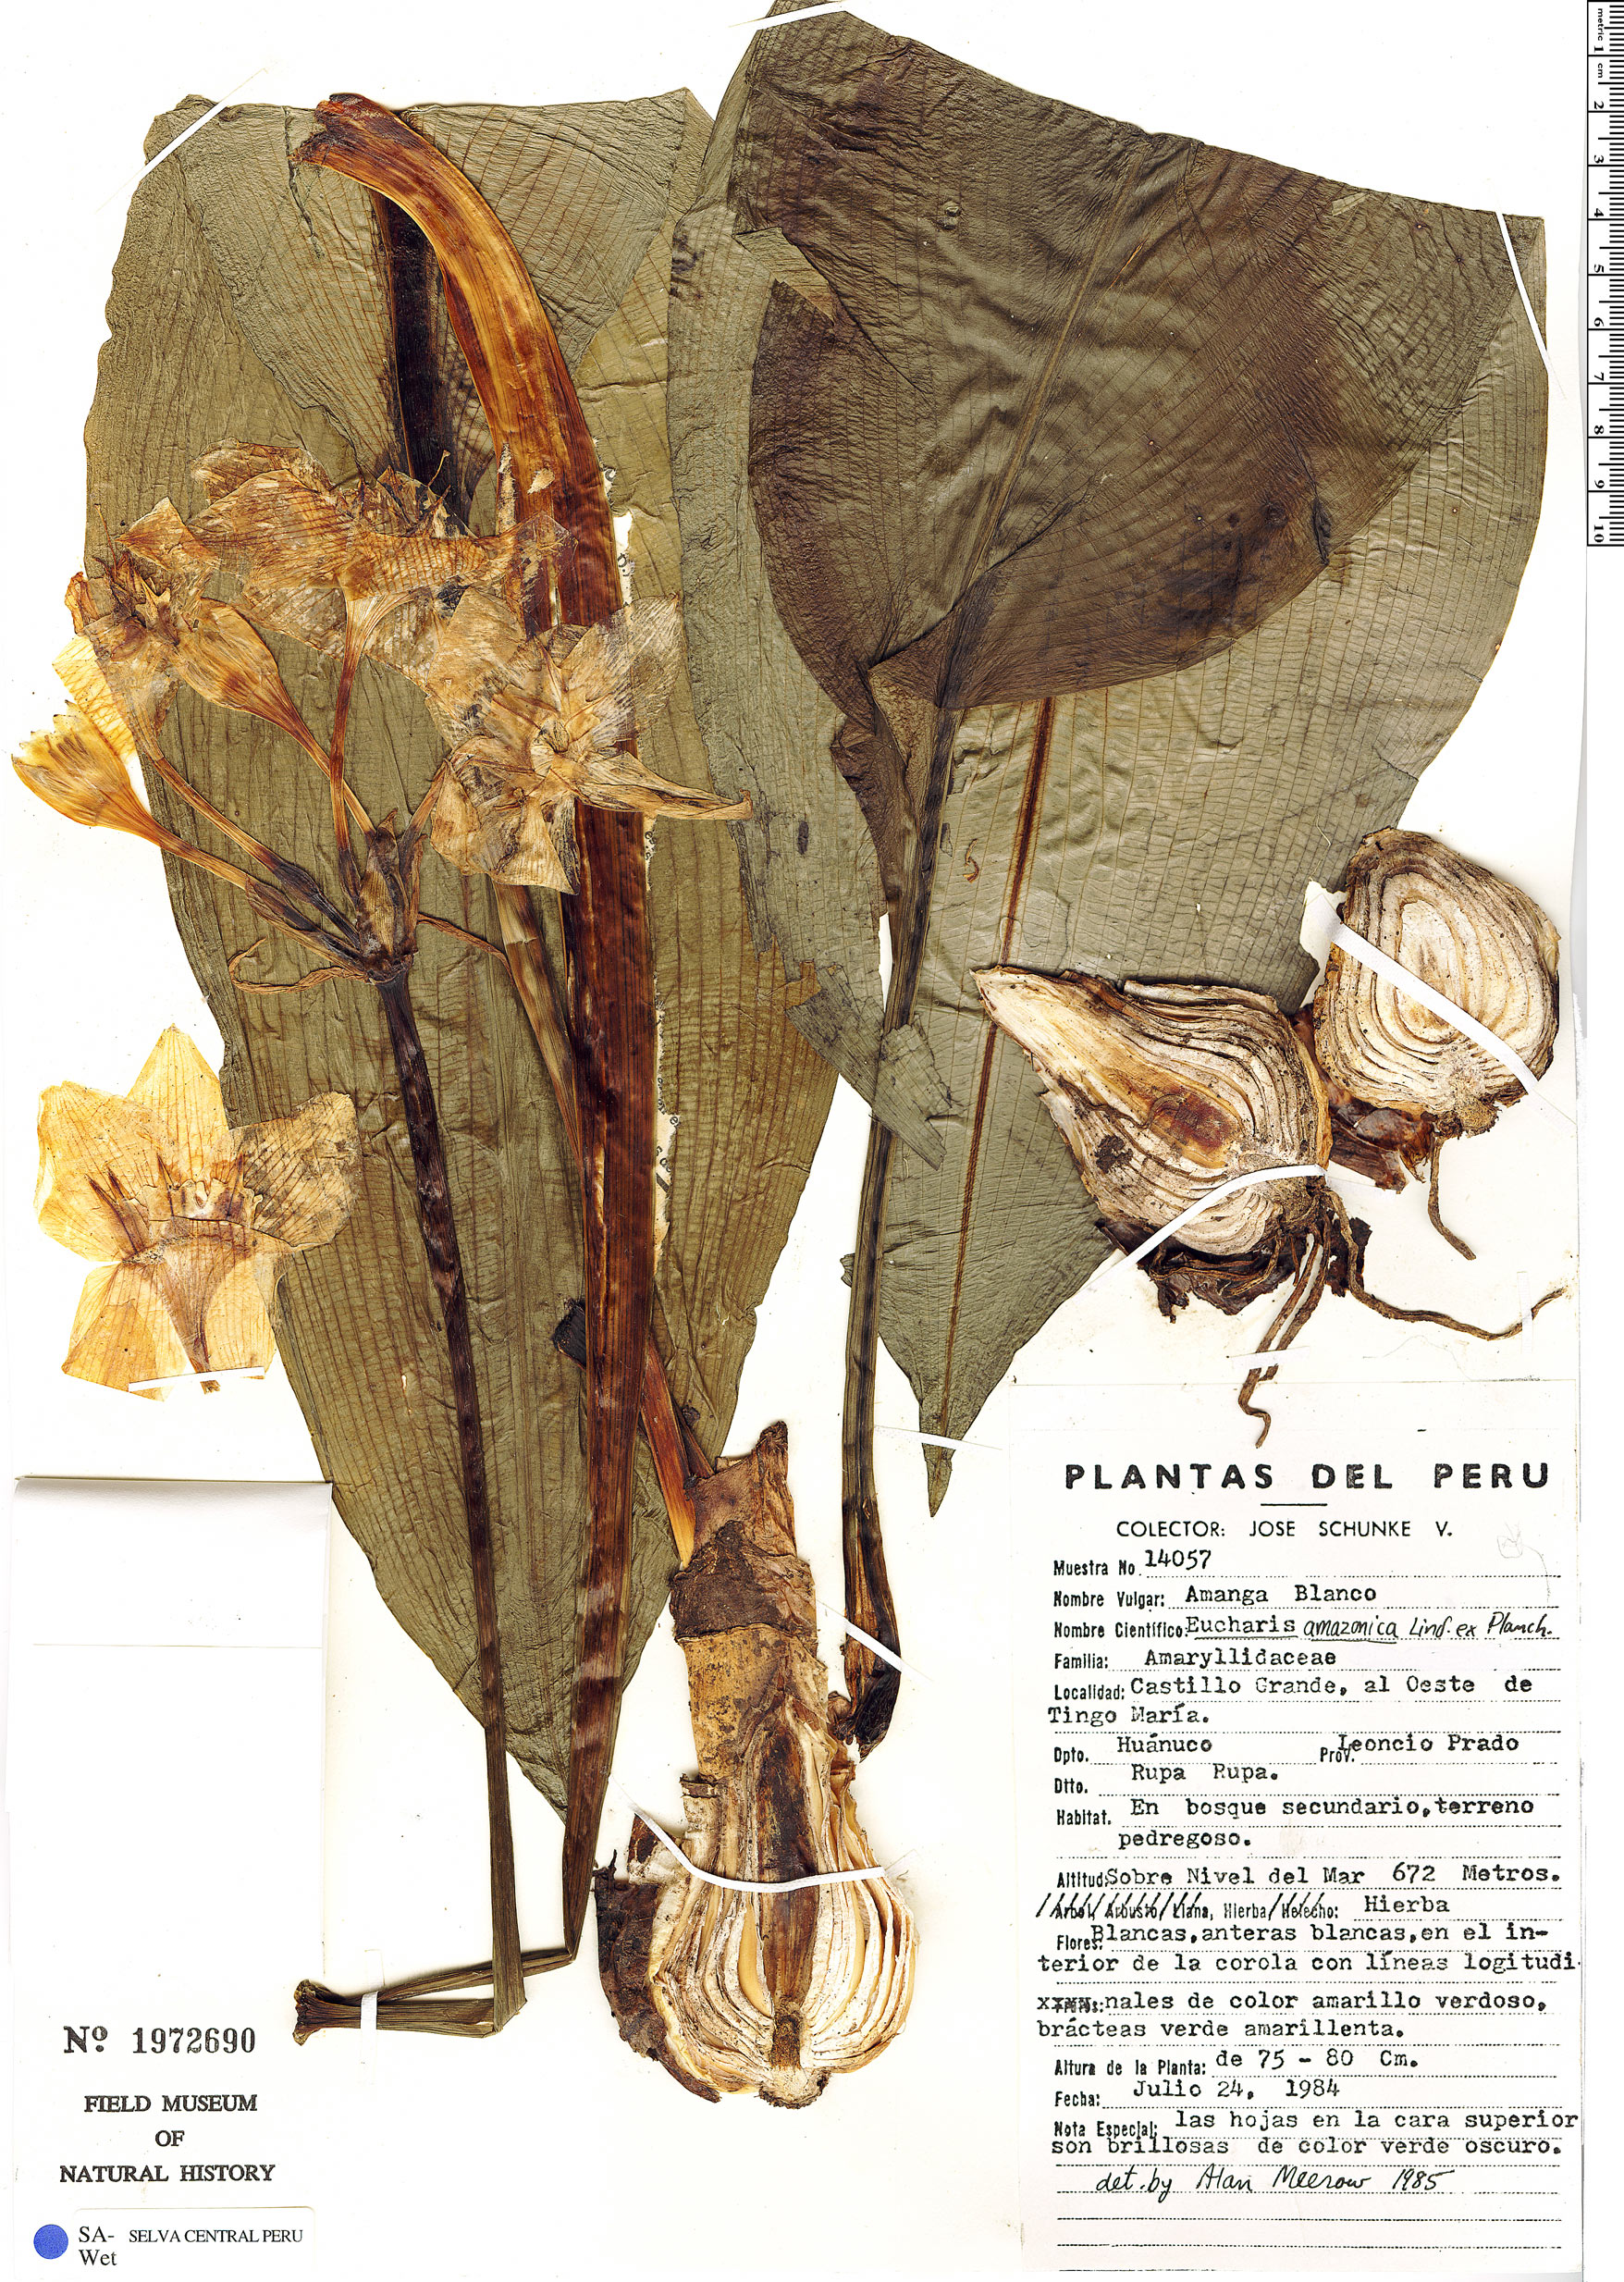 Specimen: Eucharis amazonica